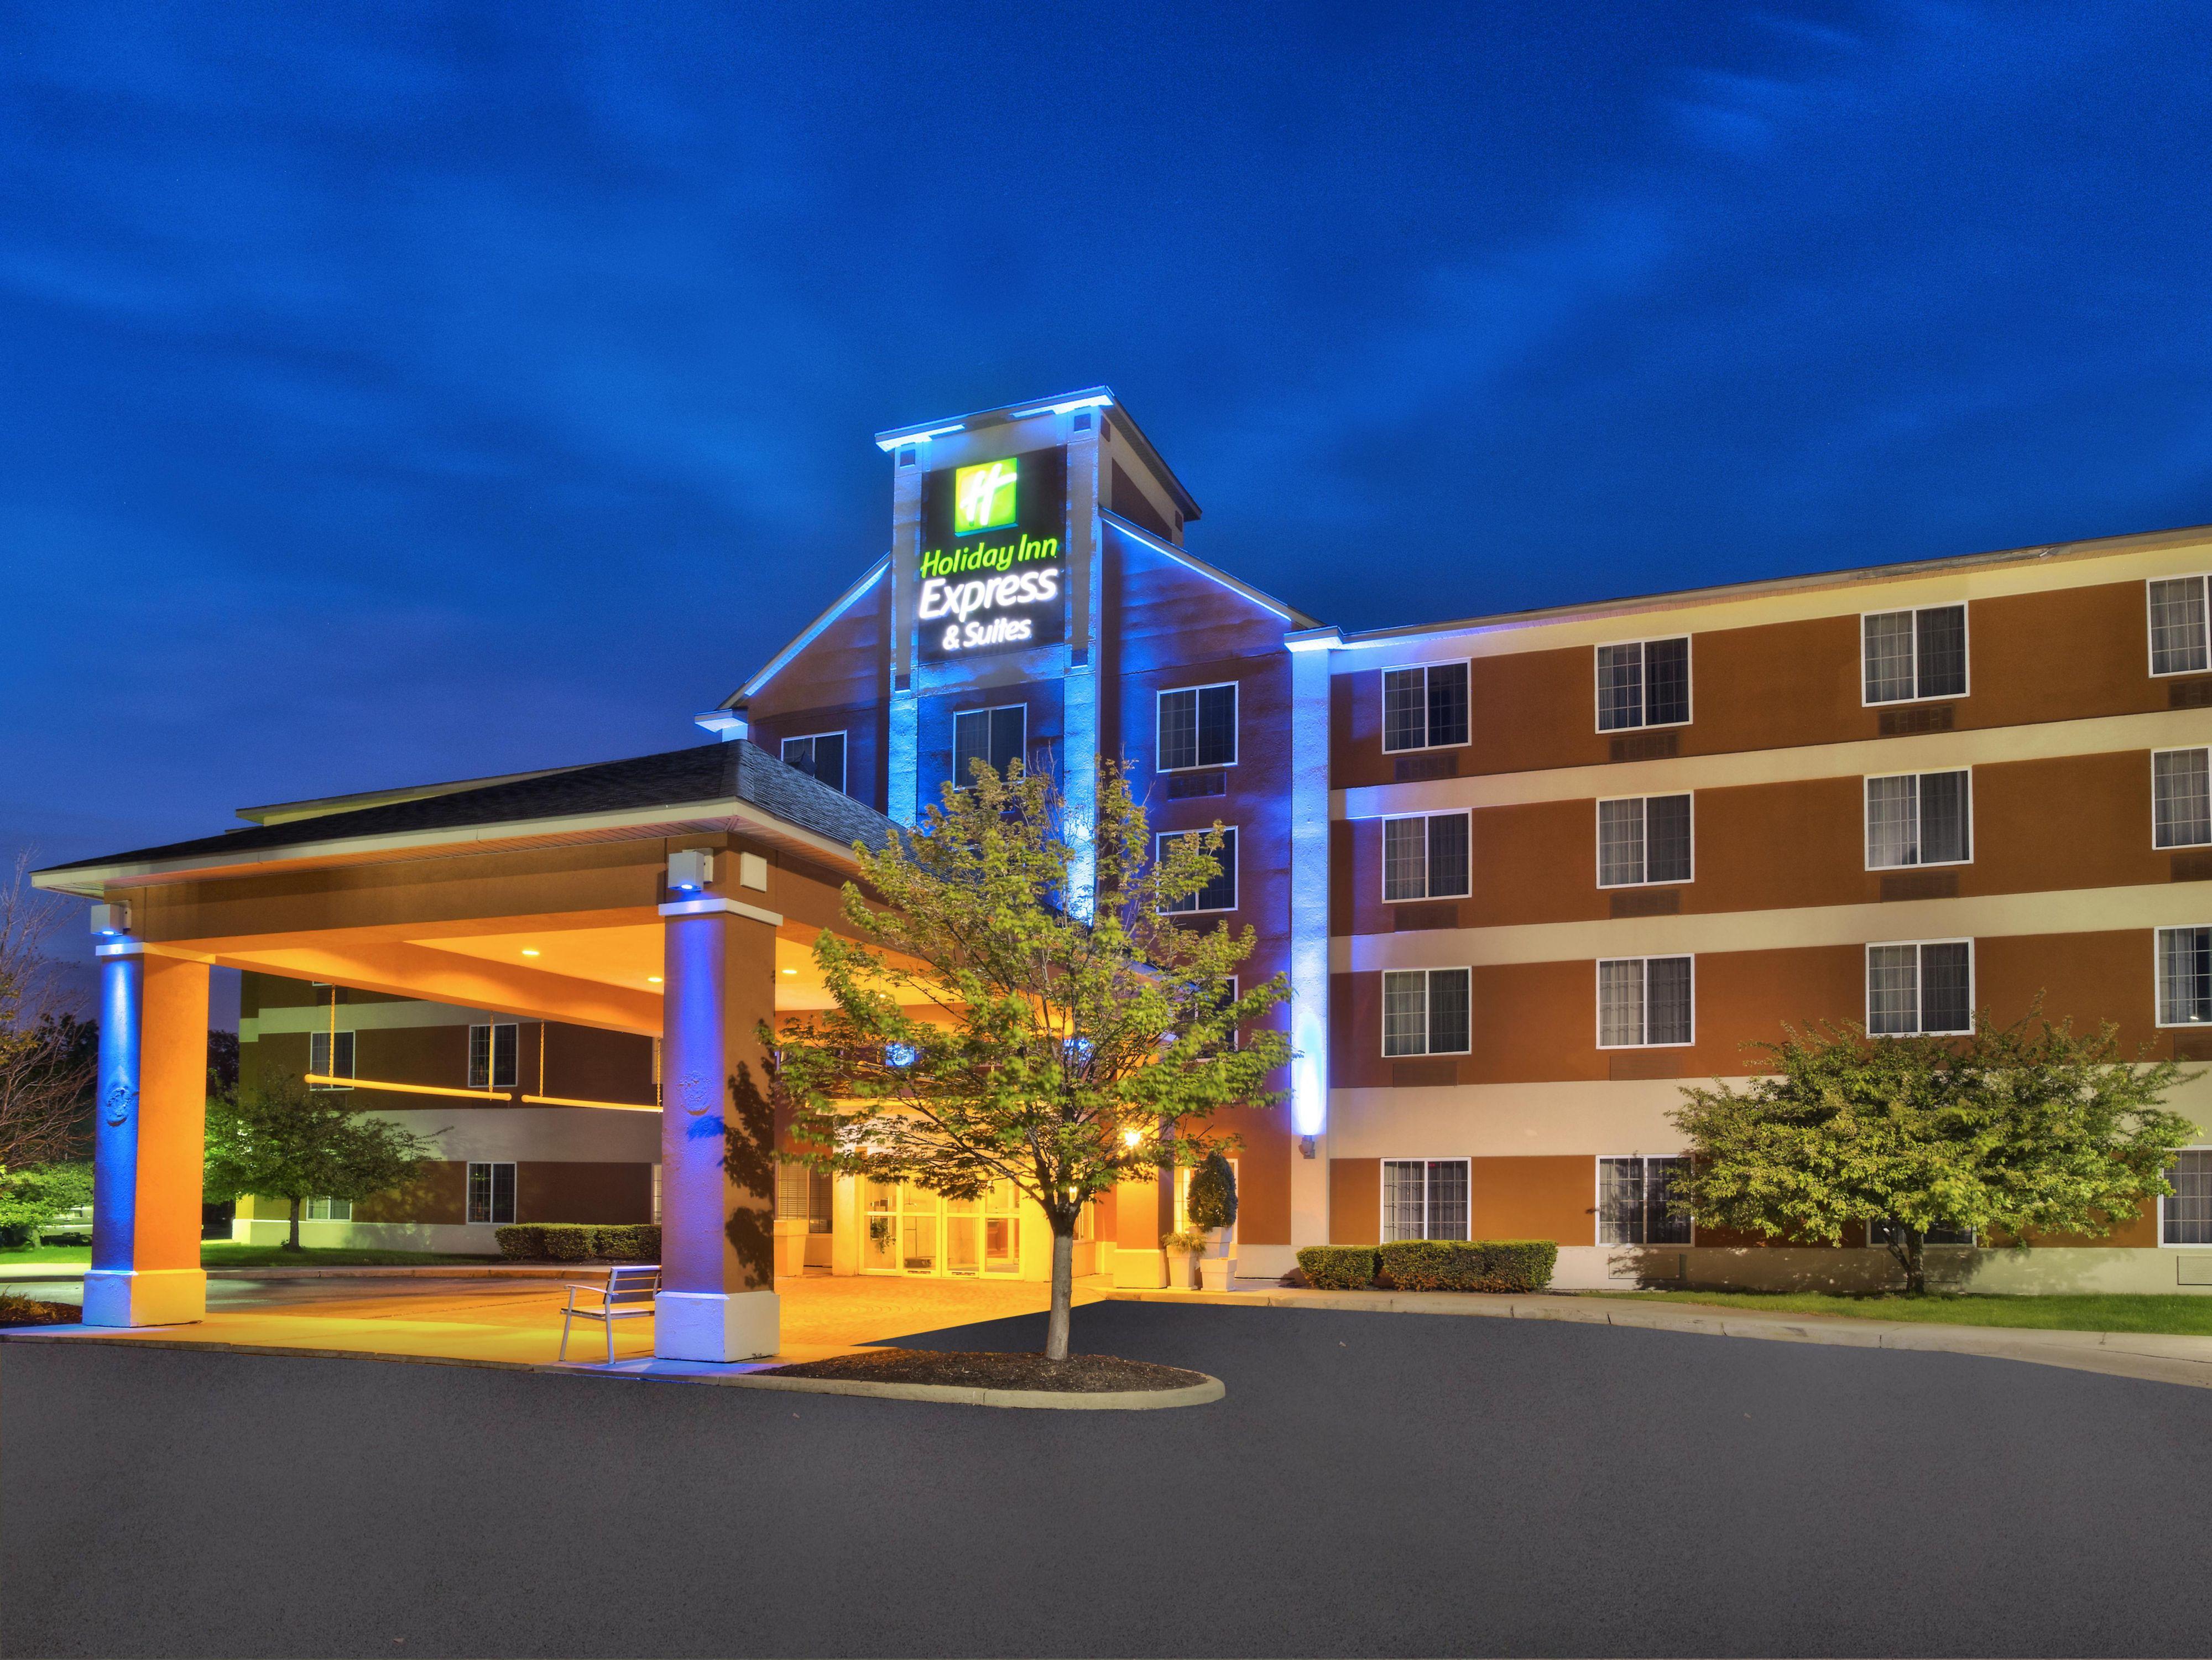 4 star hotels in ann arbor 2018 world 39 s best hotels. Black Bedroom Furniture Sets. Home Design Ideas